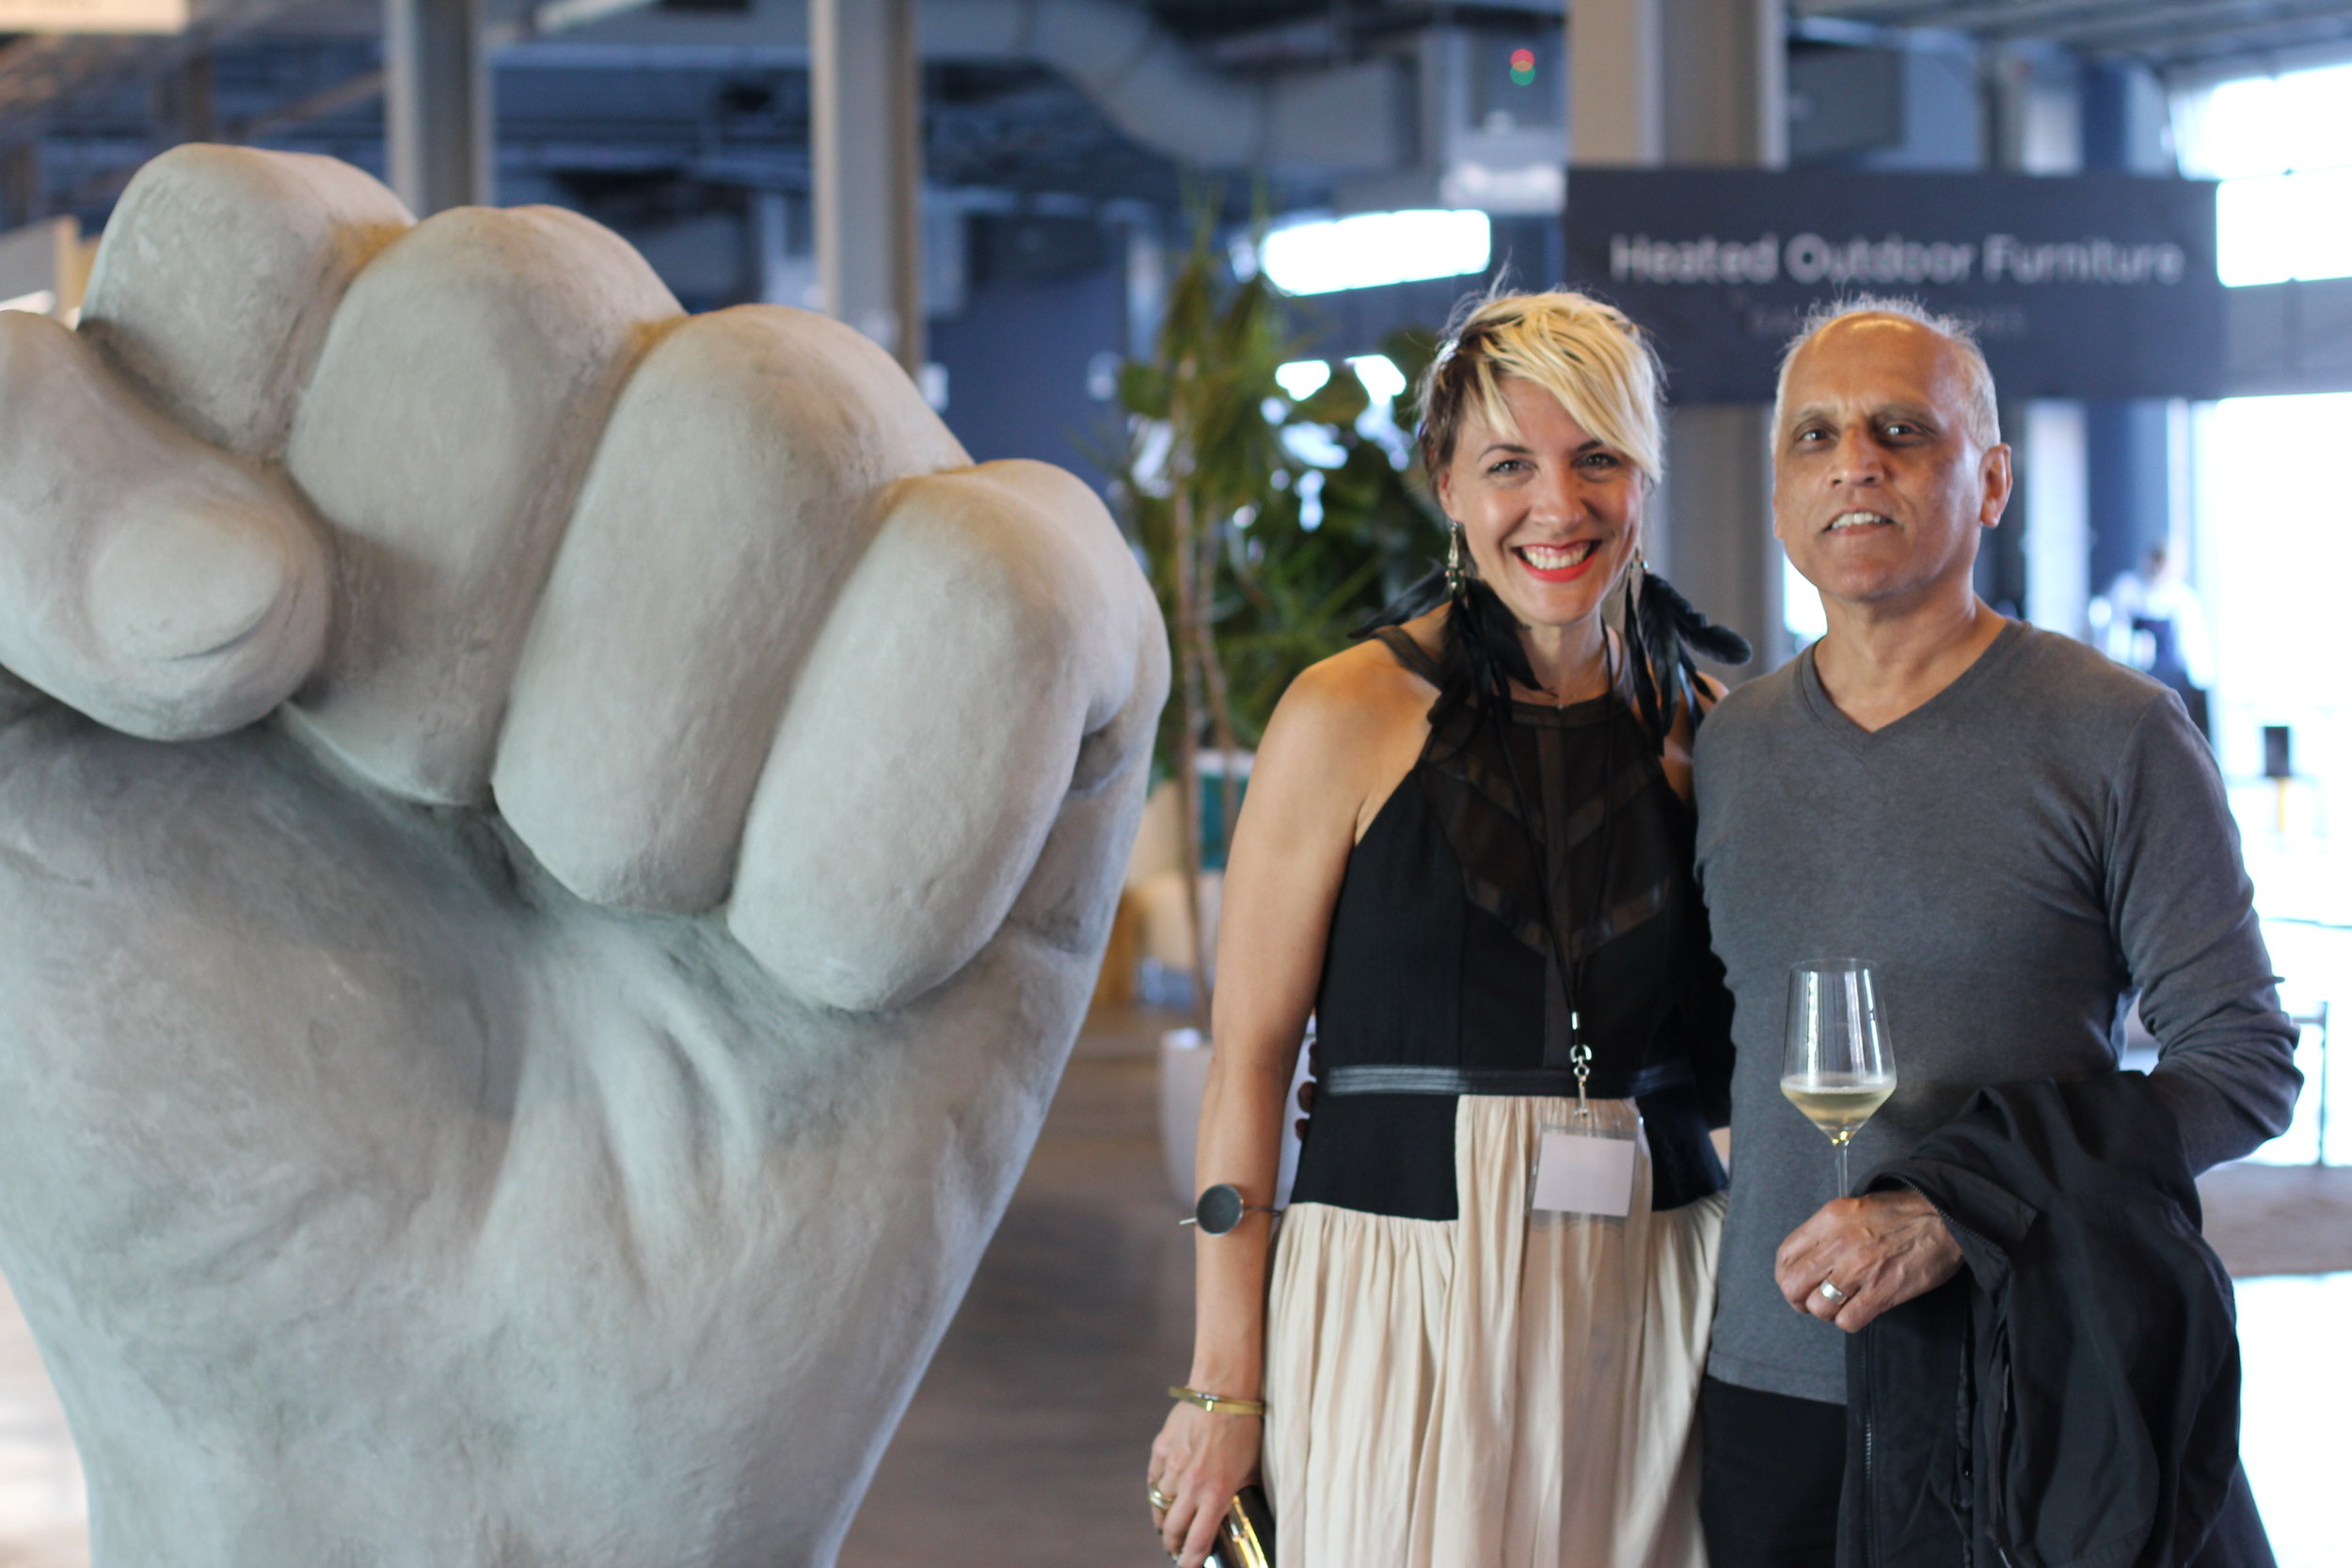 Paige Loczi and Zahid Sardar, SF Chronicle design editor & author